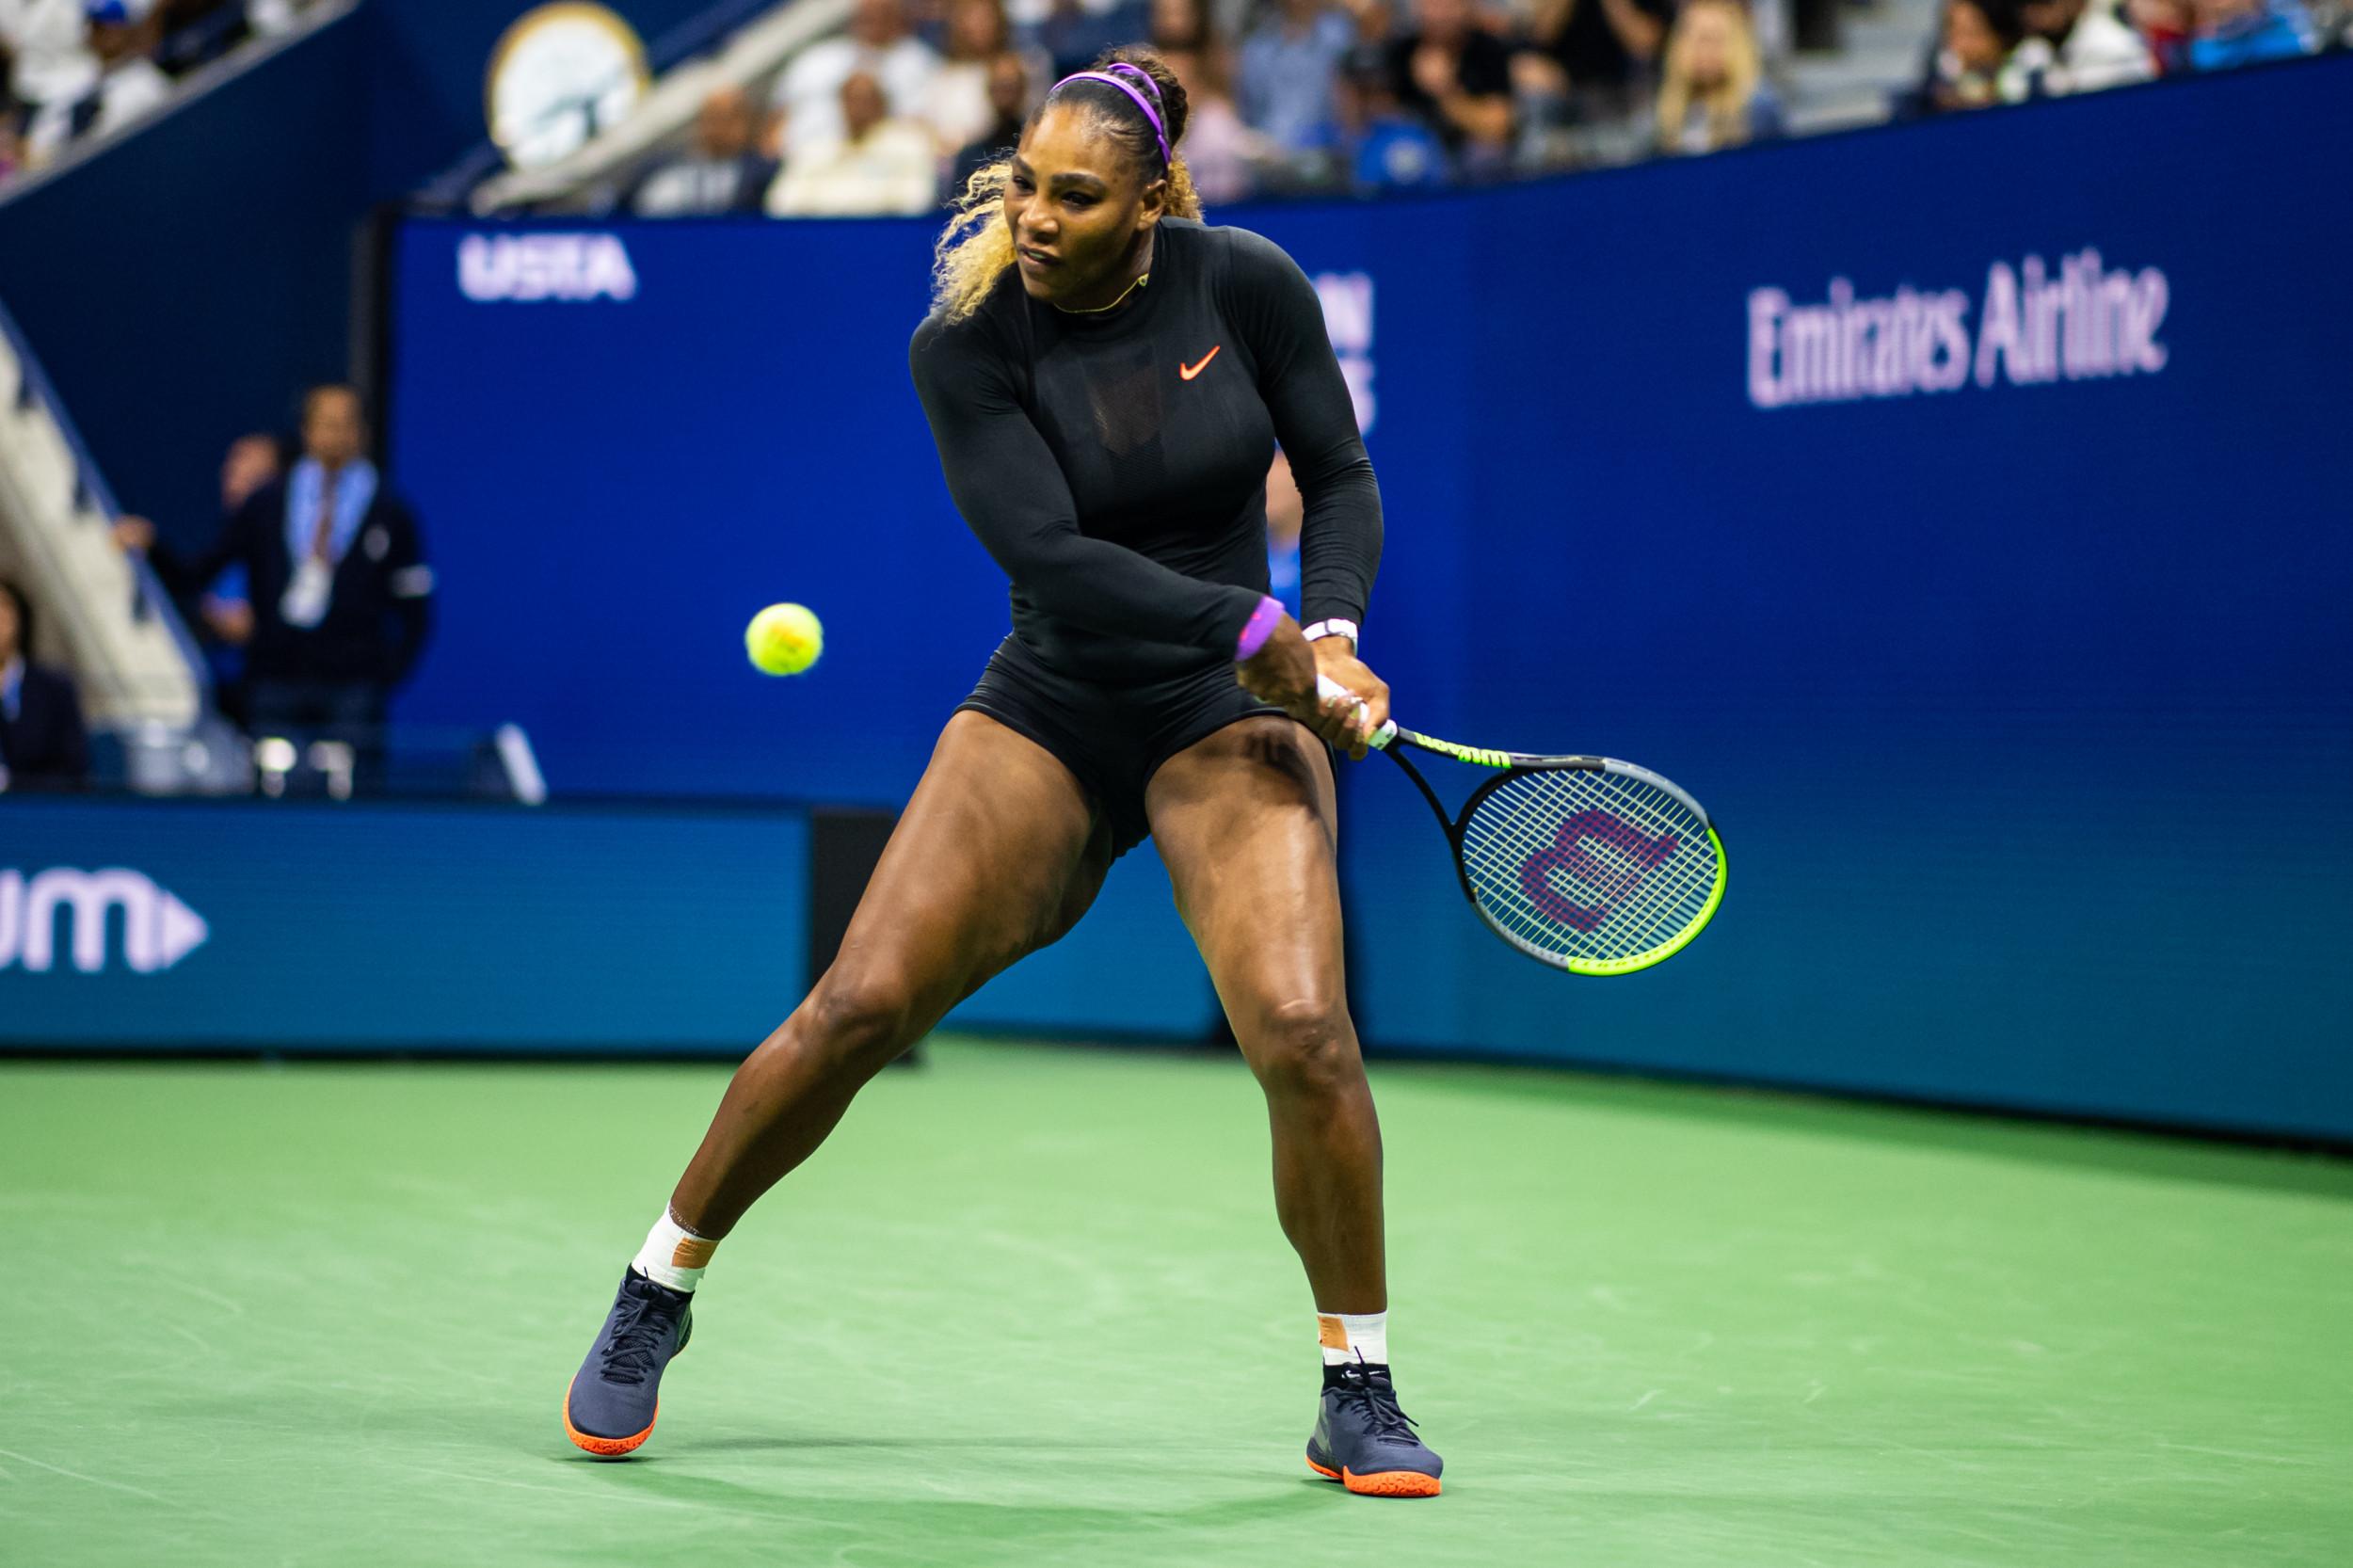 U S Open 2019 How To Watch Serena Williams Roger Federer Novak Djokovic Second Round Matches Start Times Live Stream